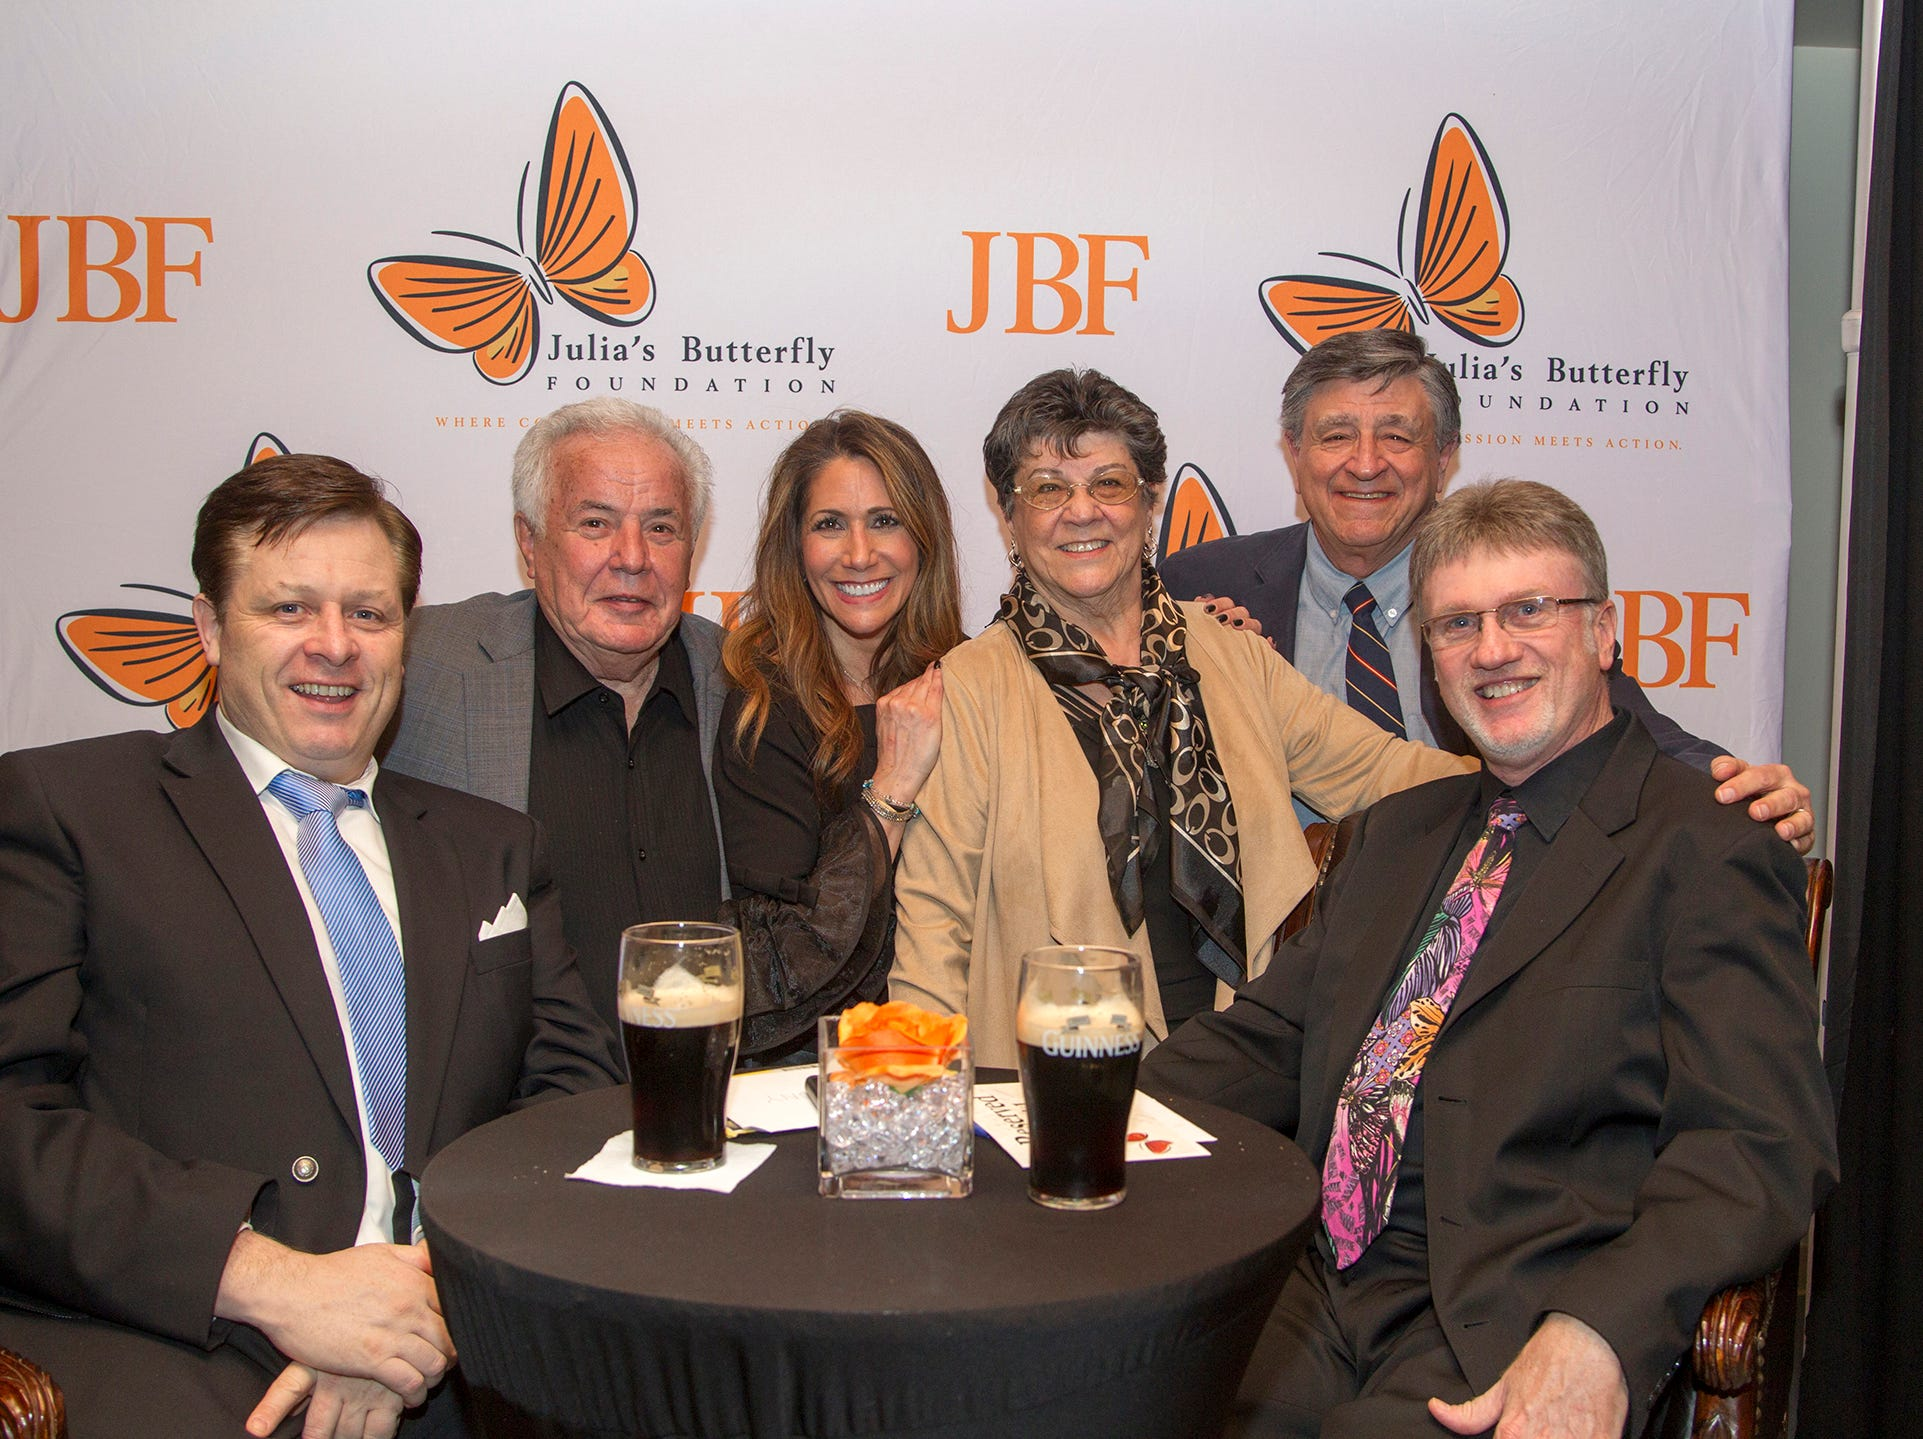 Anthony Kearns, Lou Andreozzi, Lori Thinwel, Maria,Andreozzi, Joe Blondin, David George.  Anthony Kearns benefit concert to benefit Julia's Butterfly Foundation at West Side Presbyterian Church in Ridgewood. 3/23/2019